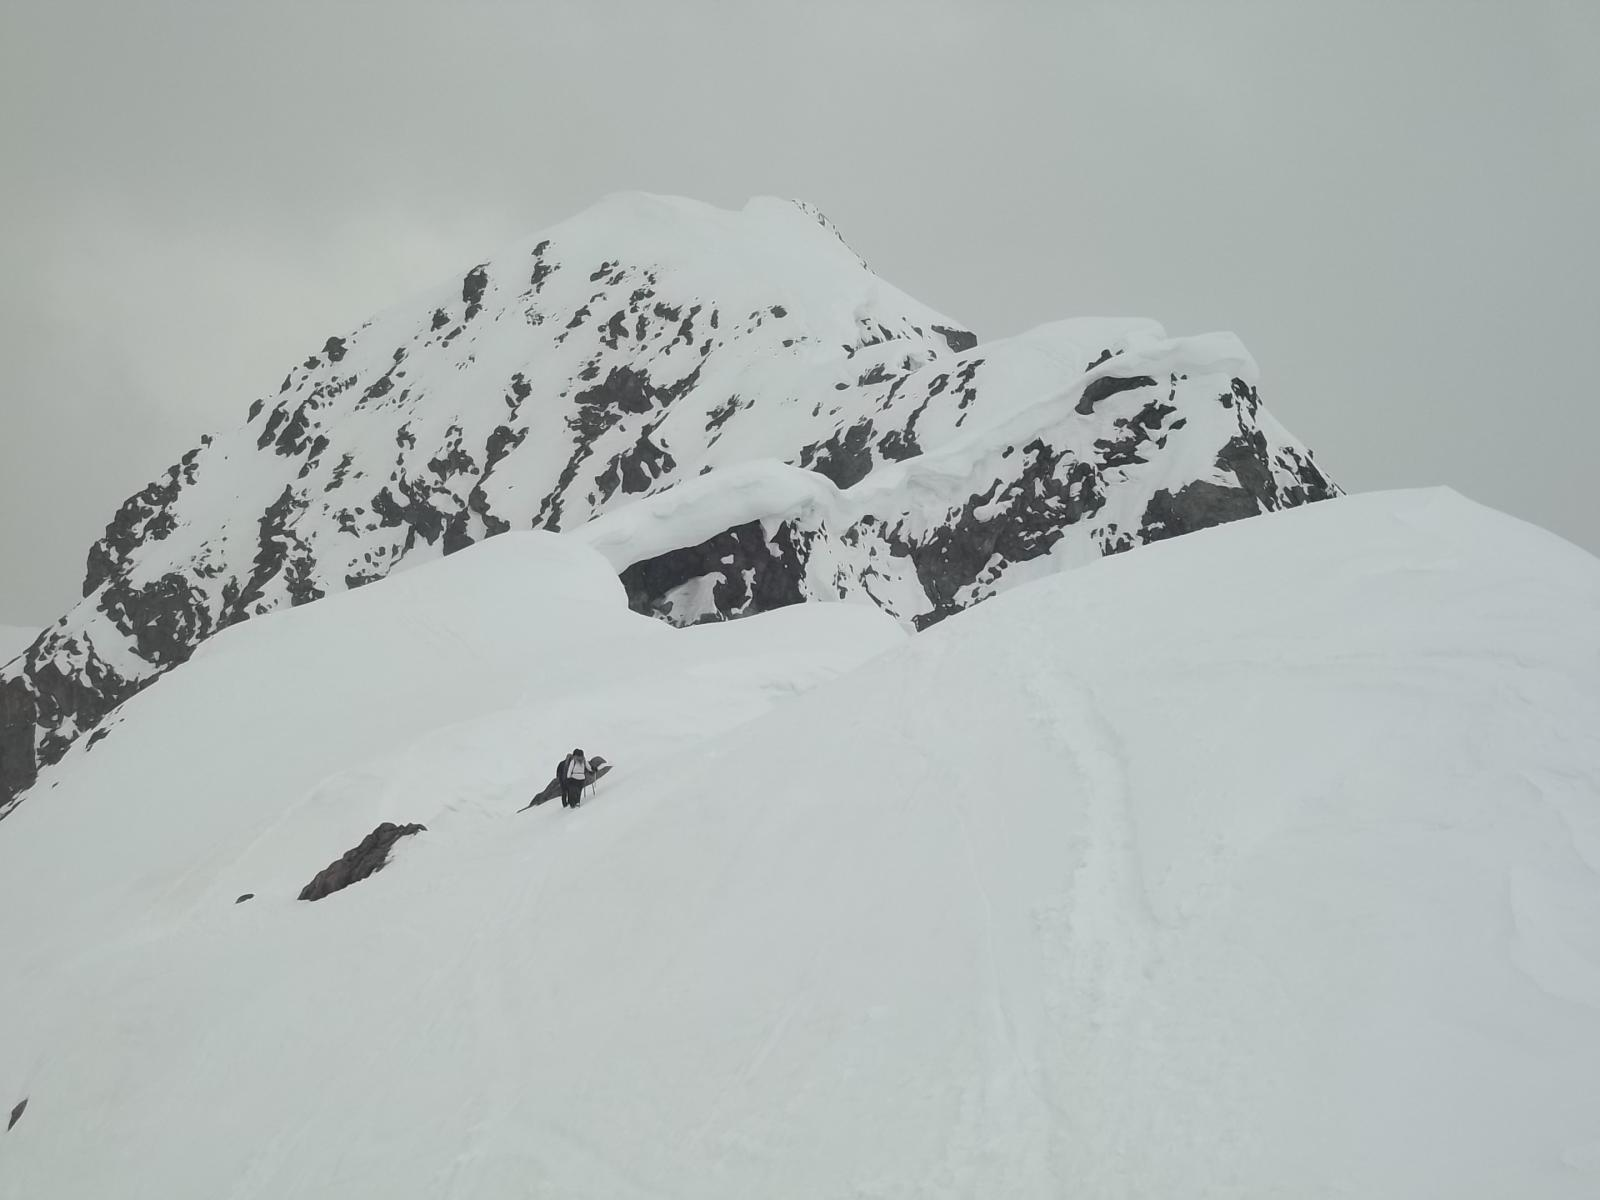 cresta alpinistica